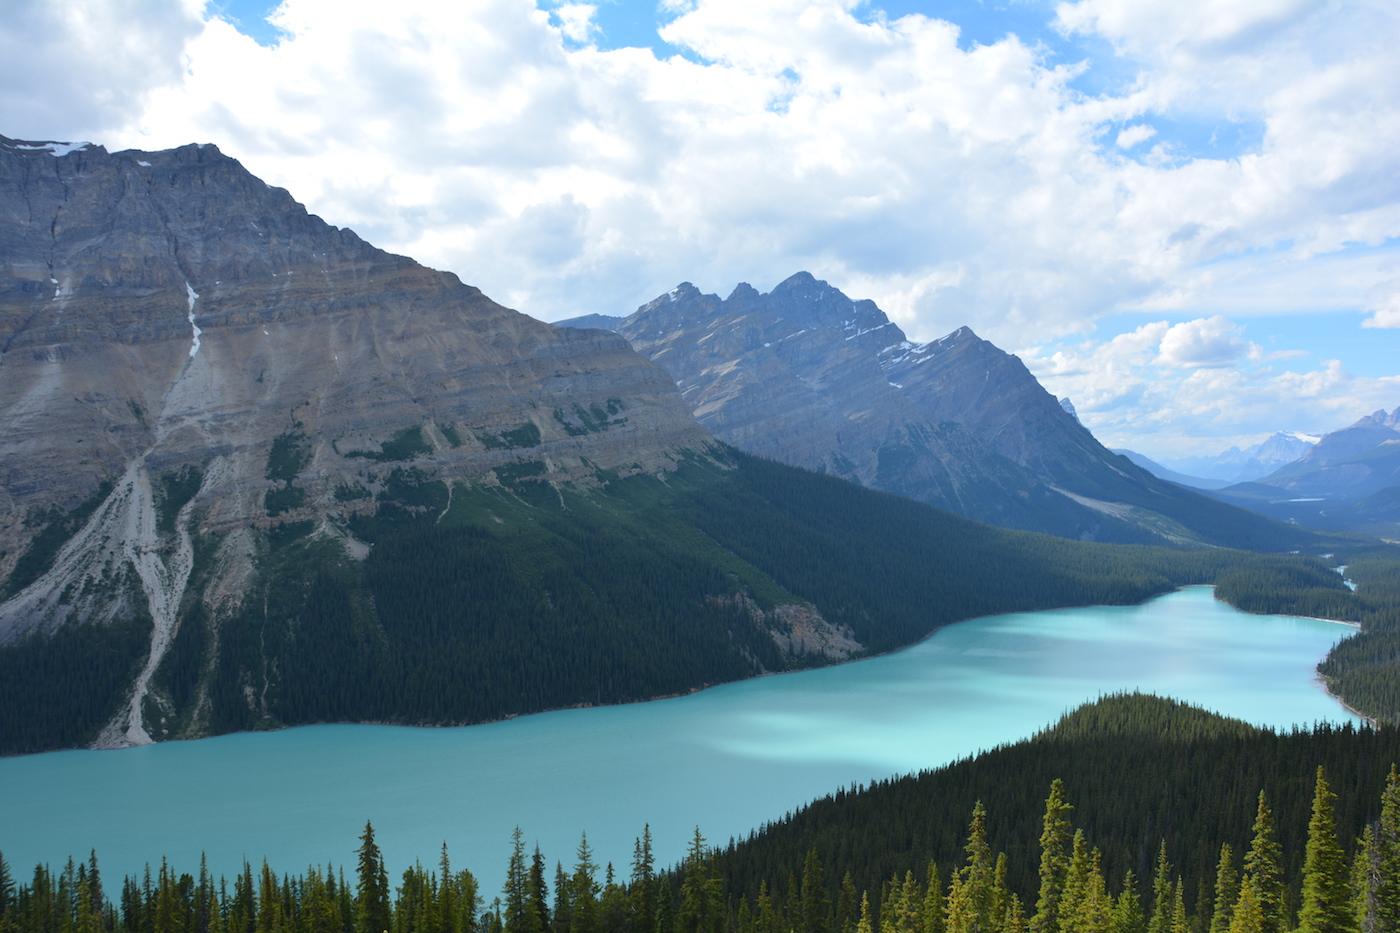 West Canada foto's